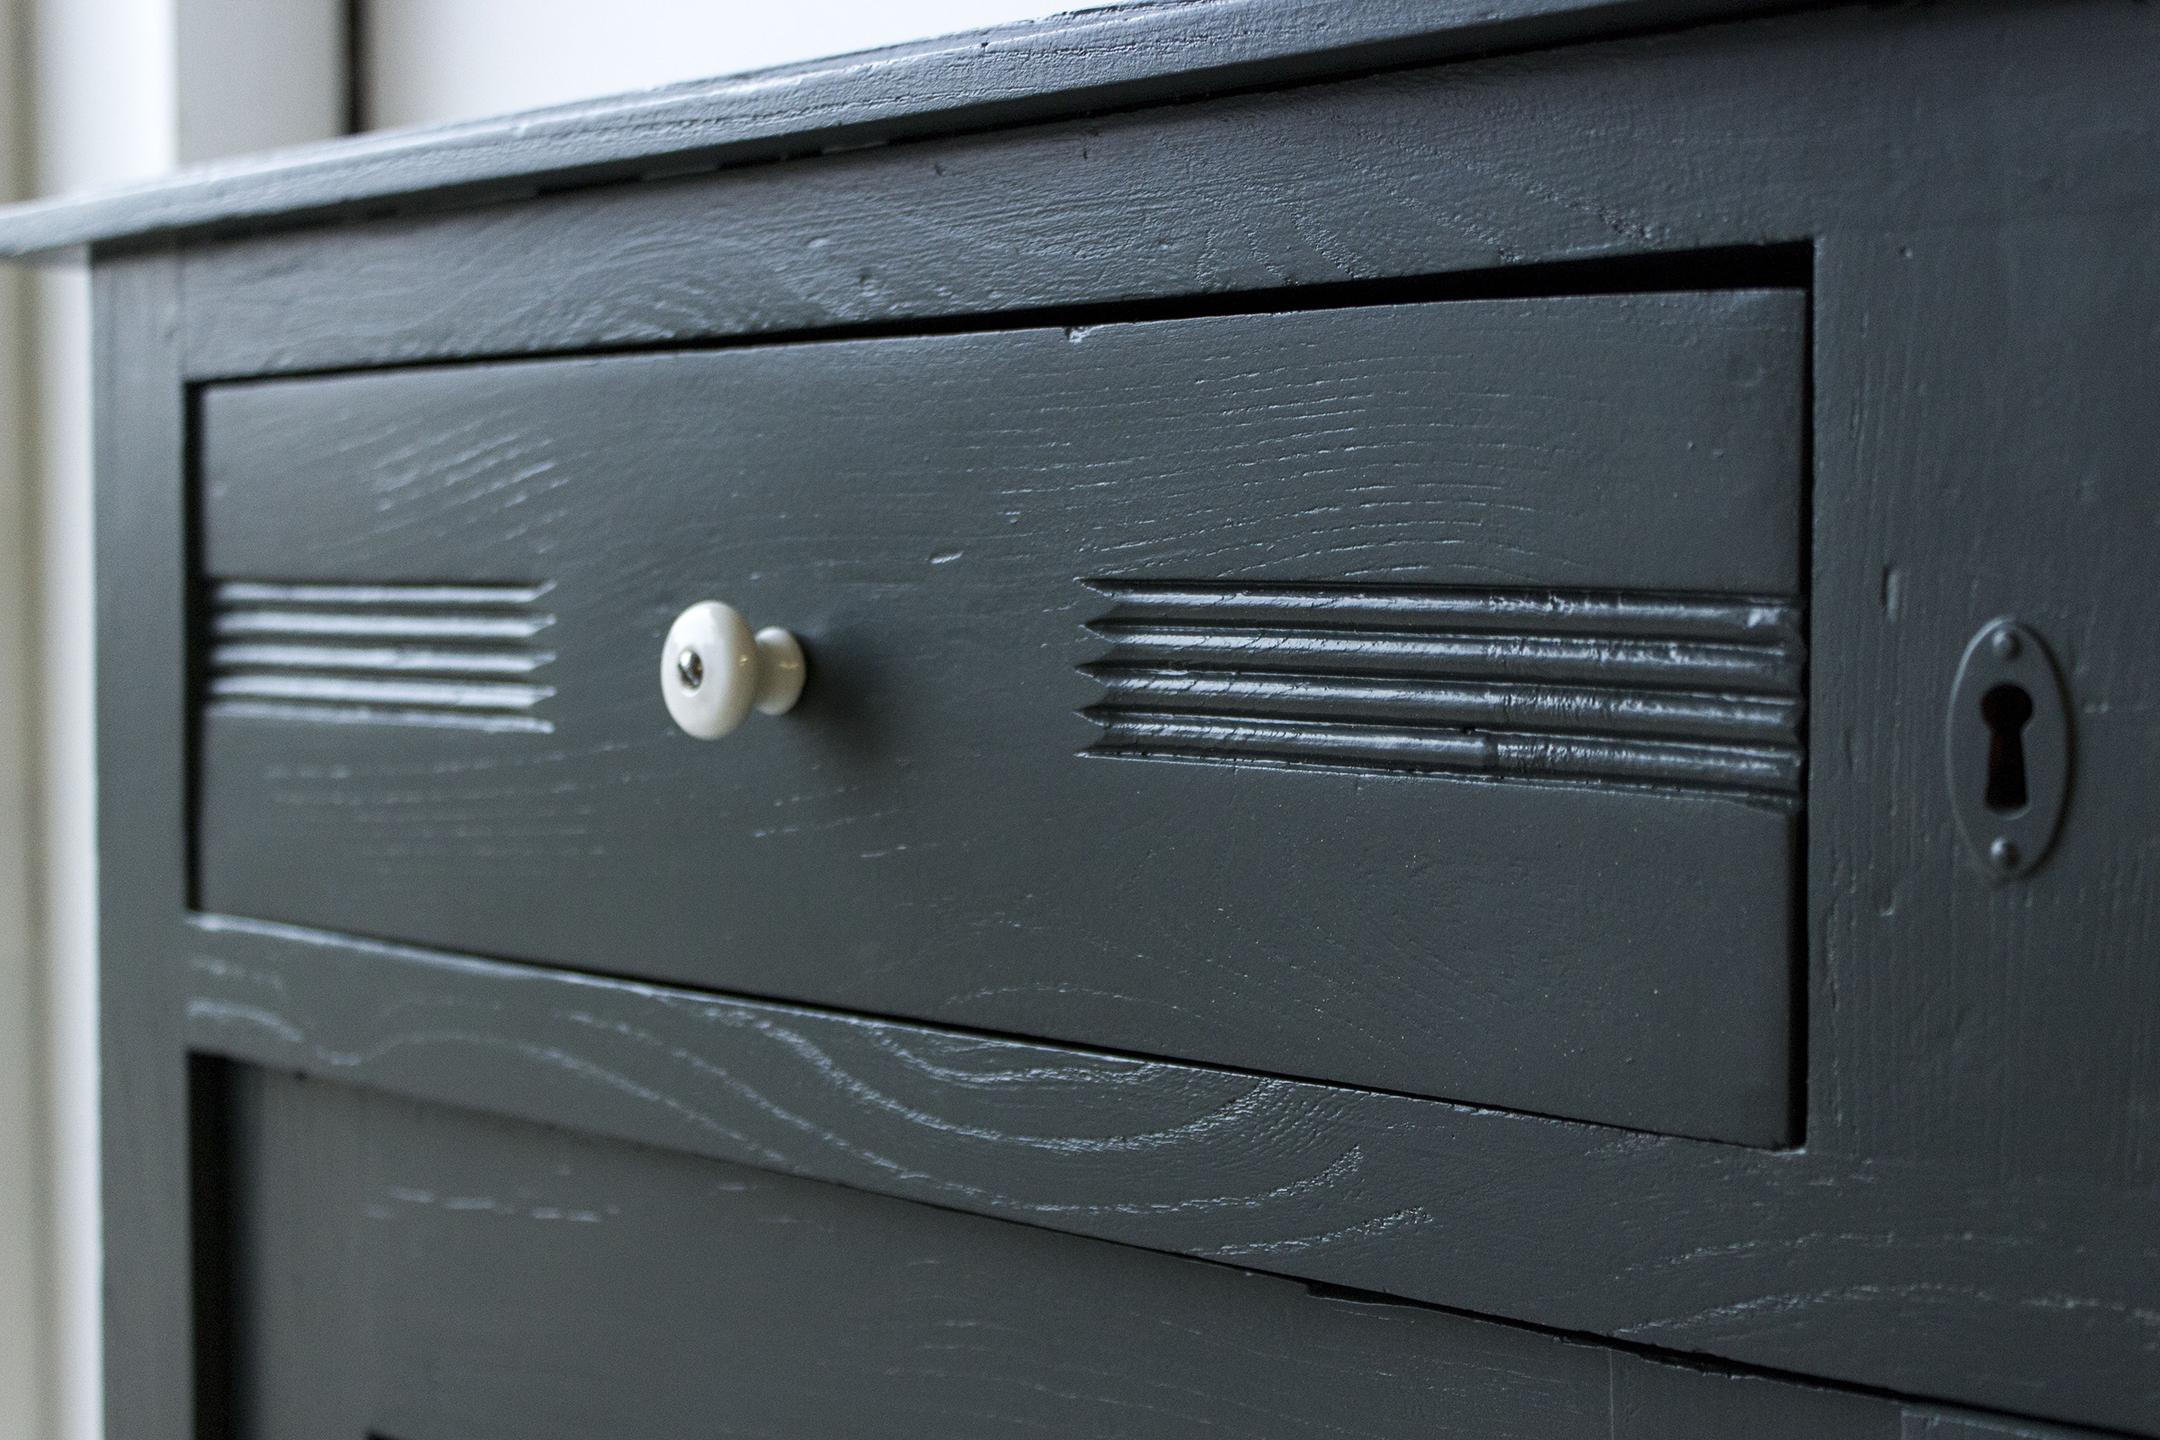 2166 - Woudgroene vintage commode - Firma zoethout_3.jpg